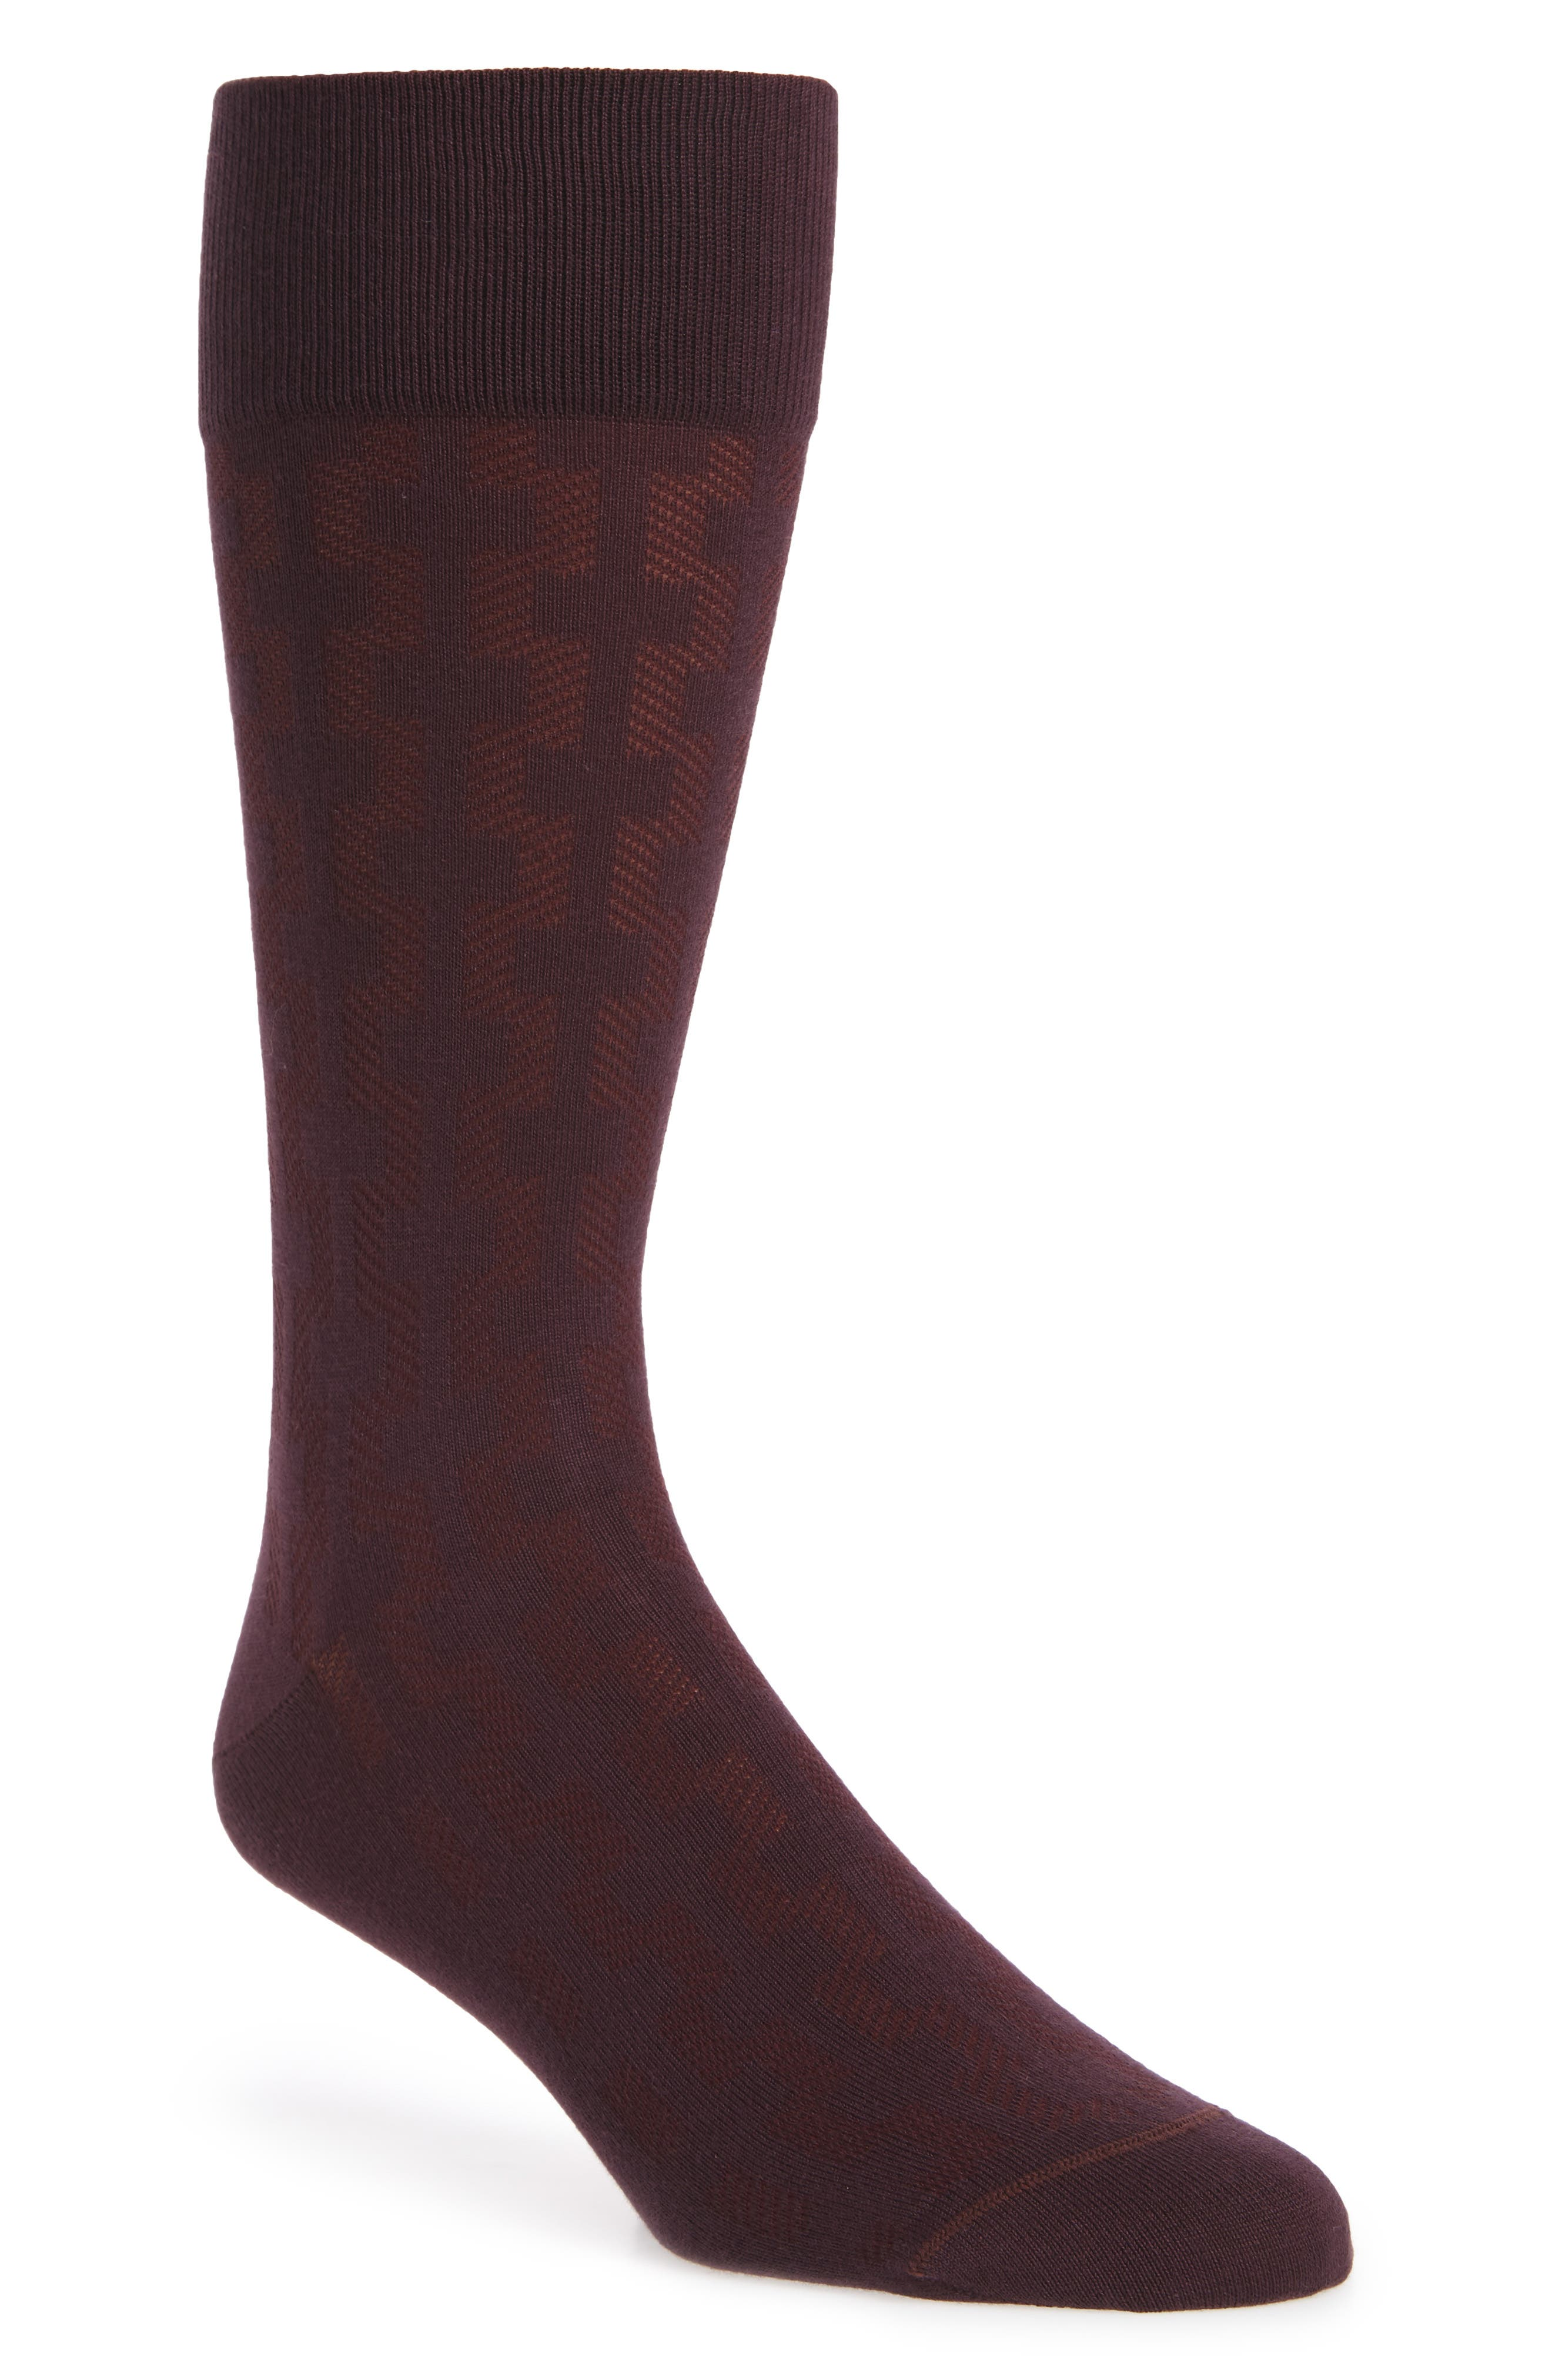 Geometric Socks,                             Main thumbnail 1, color,                             BURGUNDY FIG